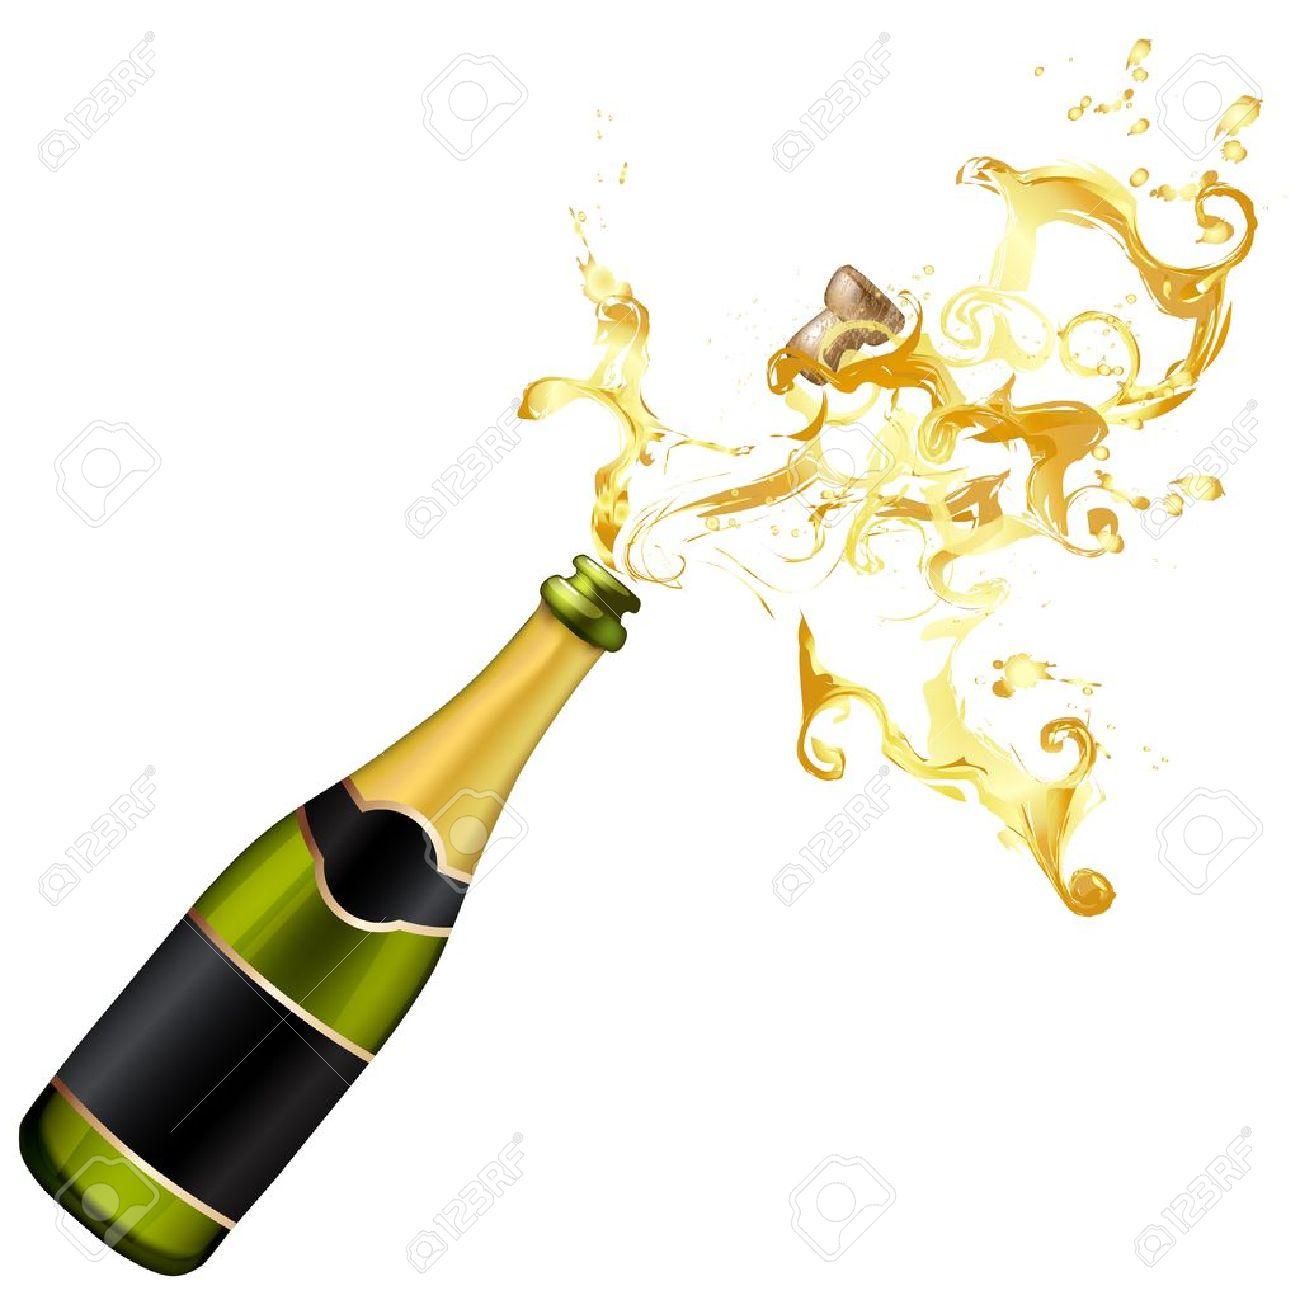 Illustration of explosion of champagne bottle cork Stock Vector - 17043766